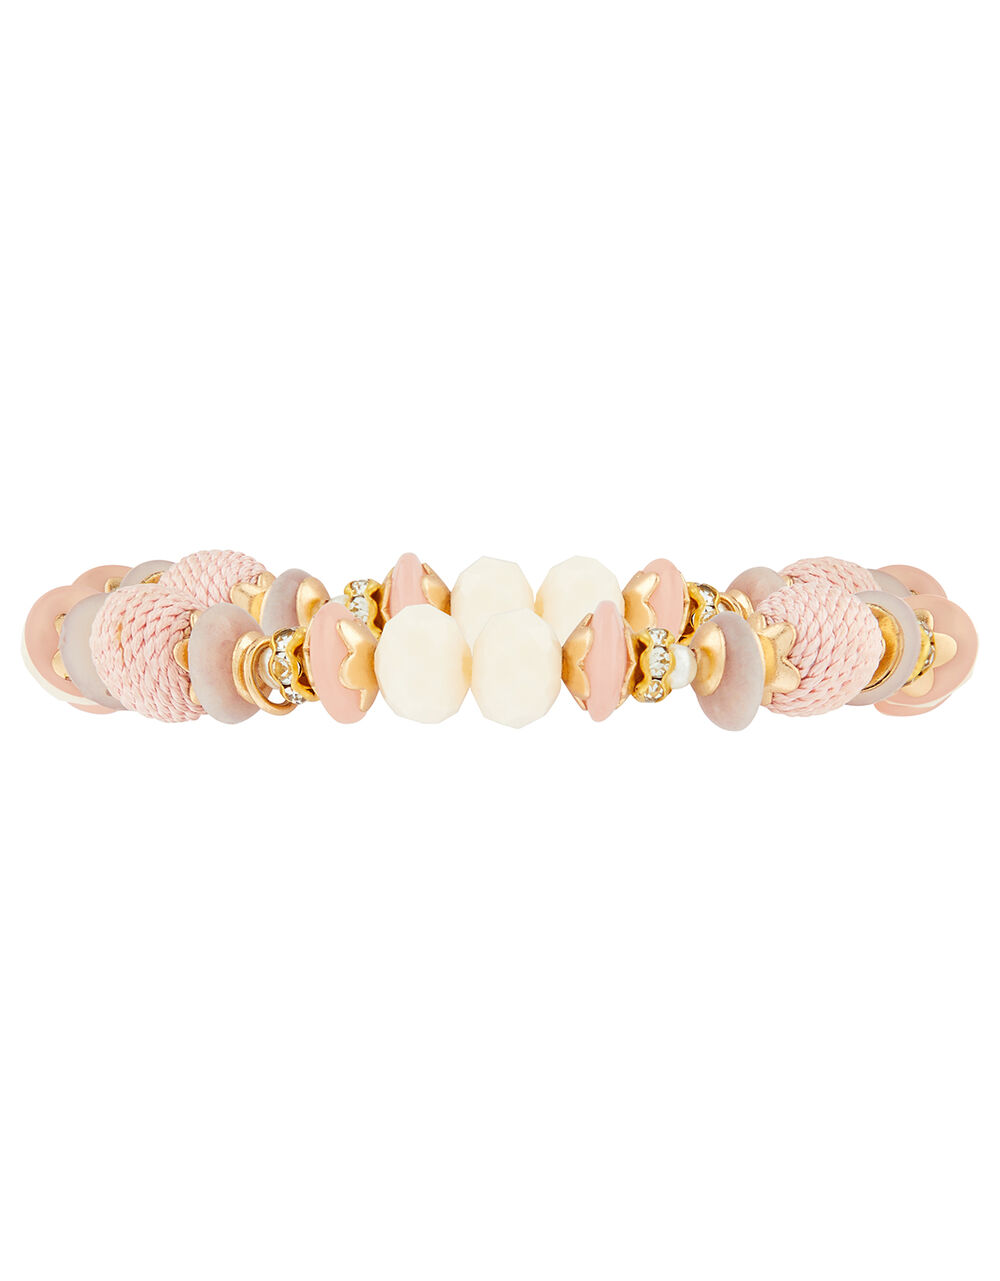 Beaded Stretch Bracelet, , large